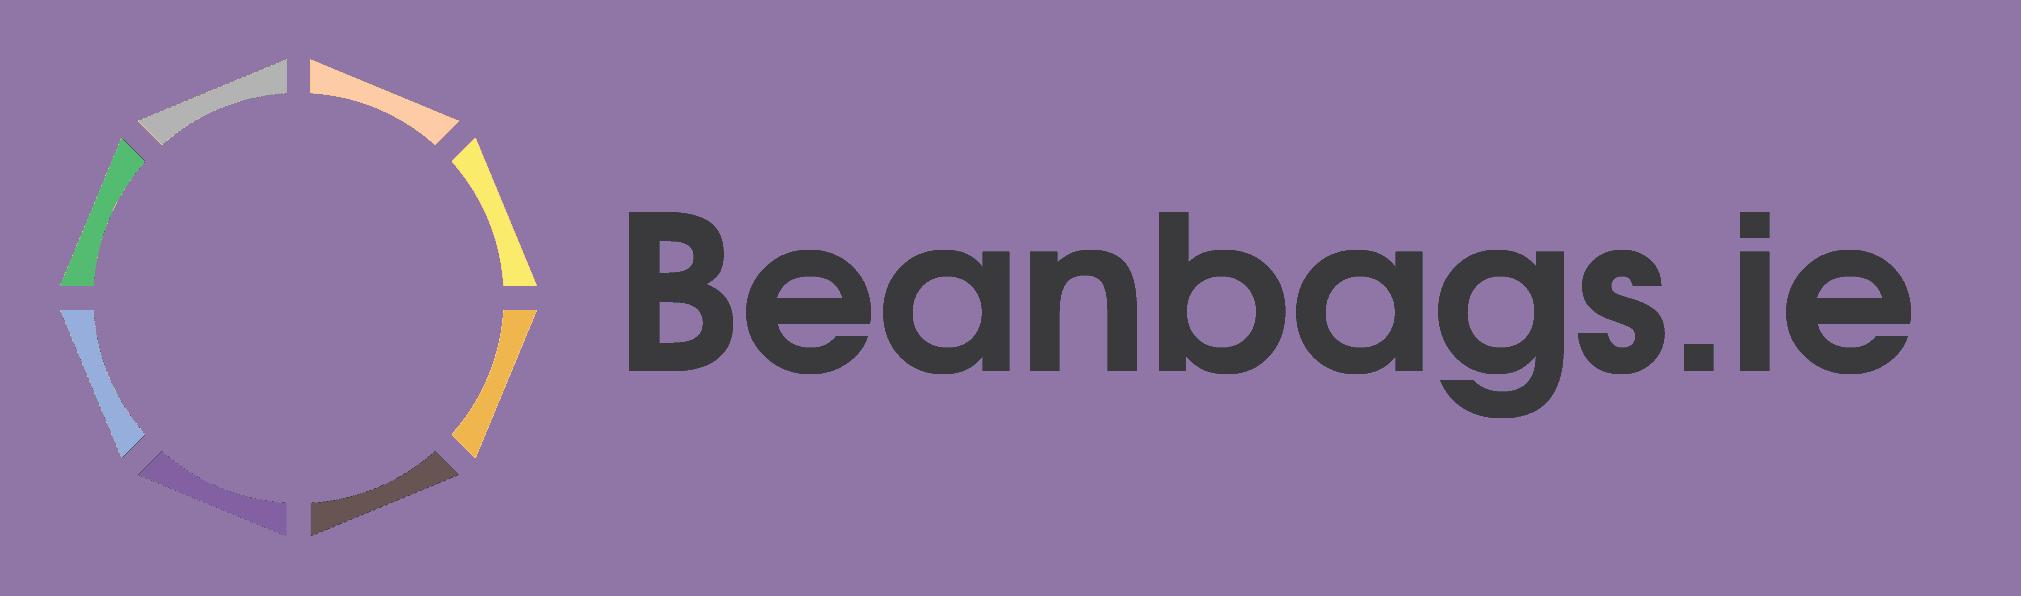 Beanbags Company